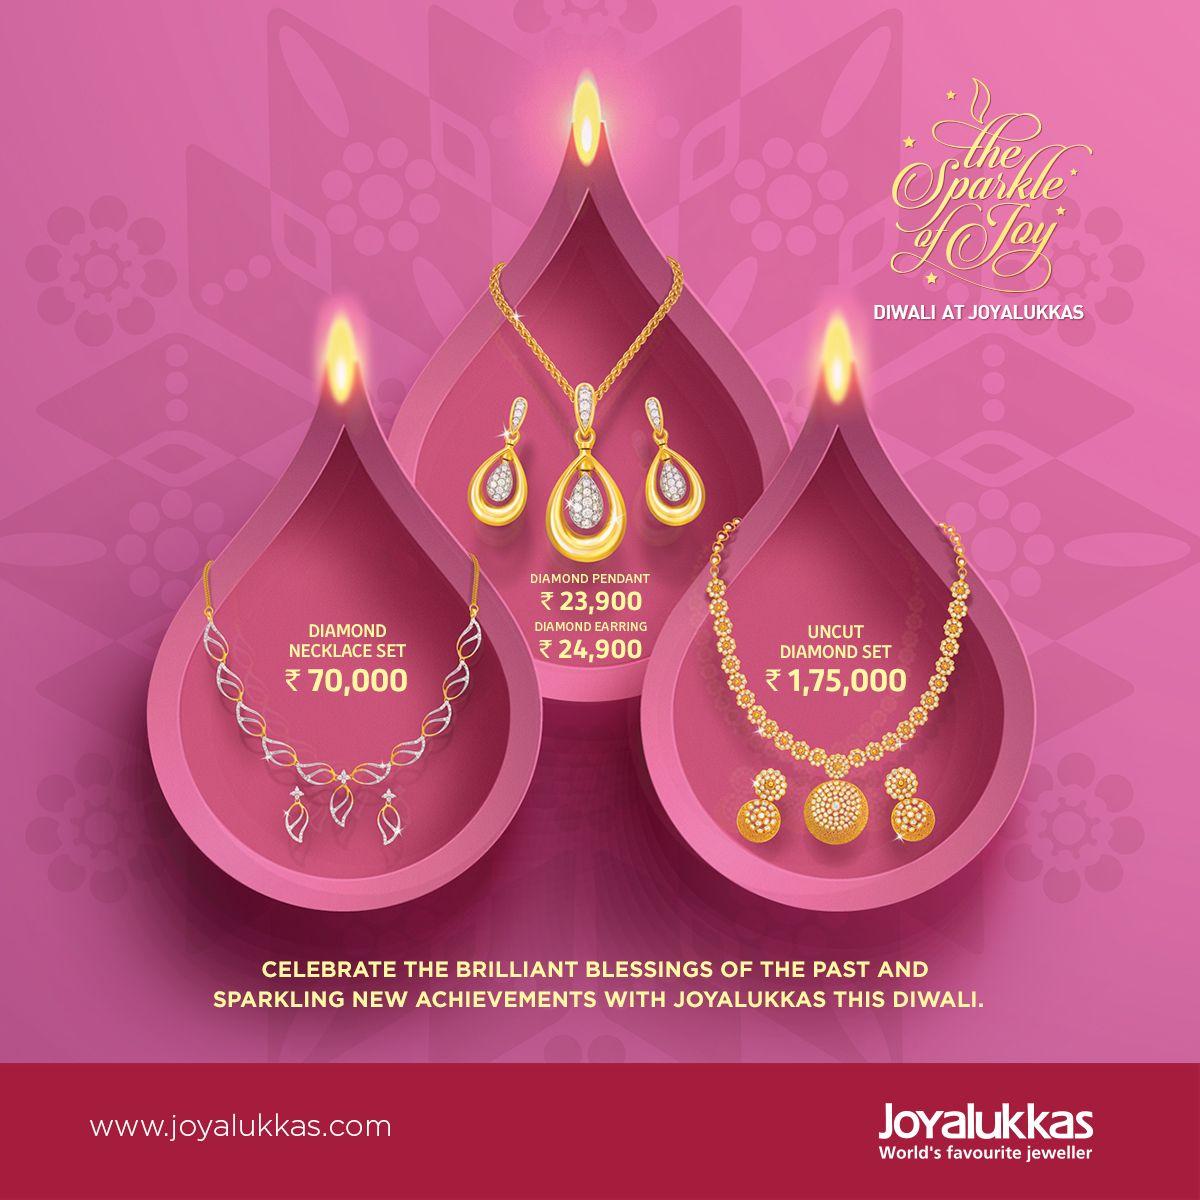 Pin by Joyalukkas on Joyalukkas | Pinterest | Diwali and Promotion